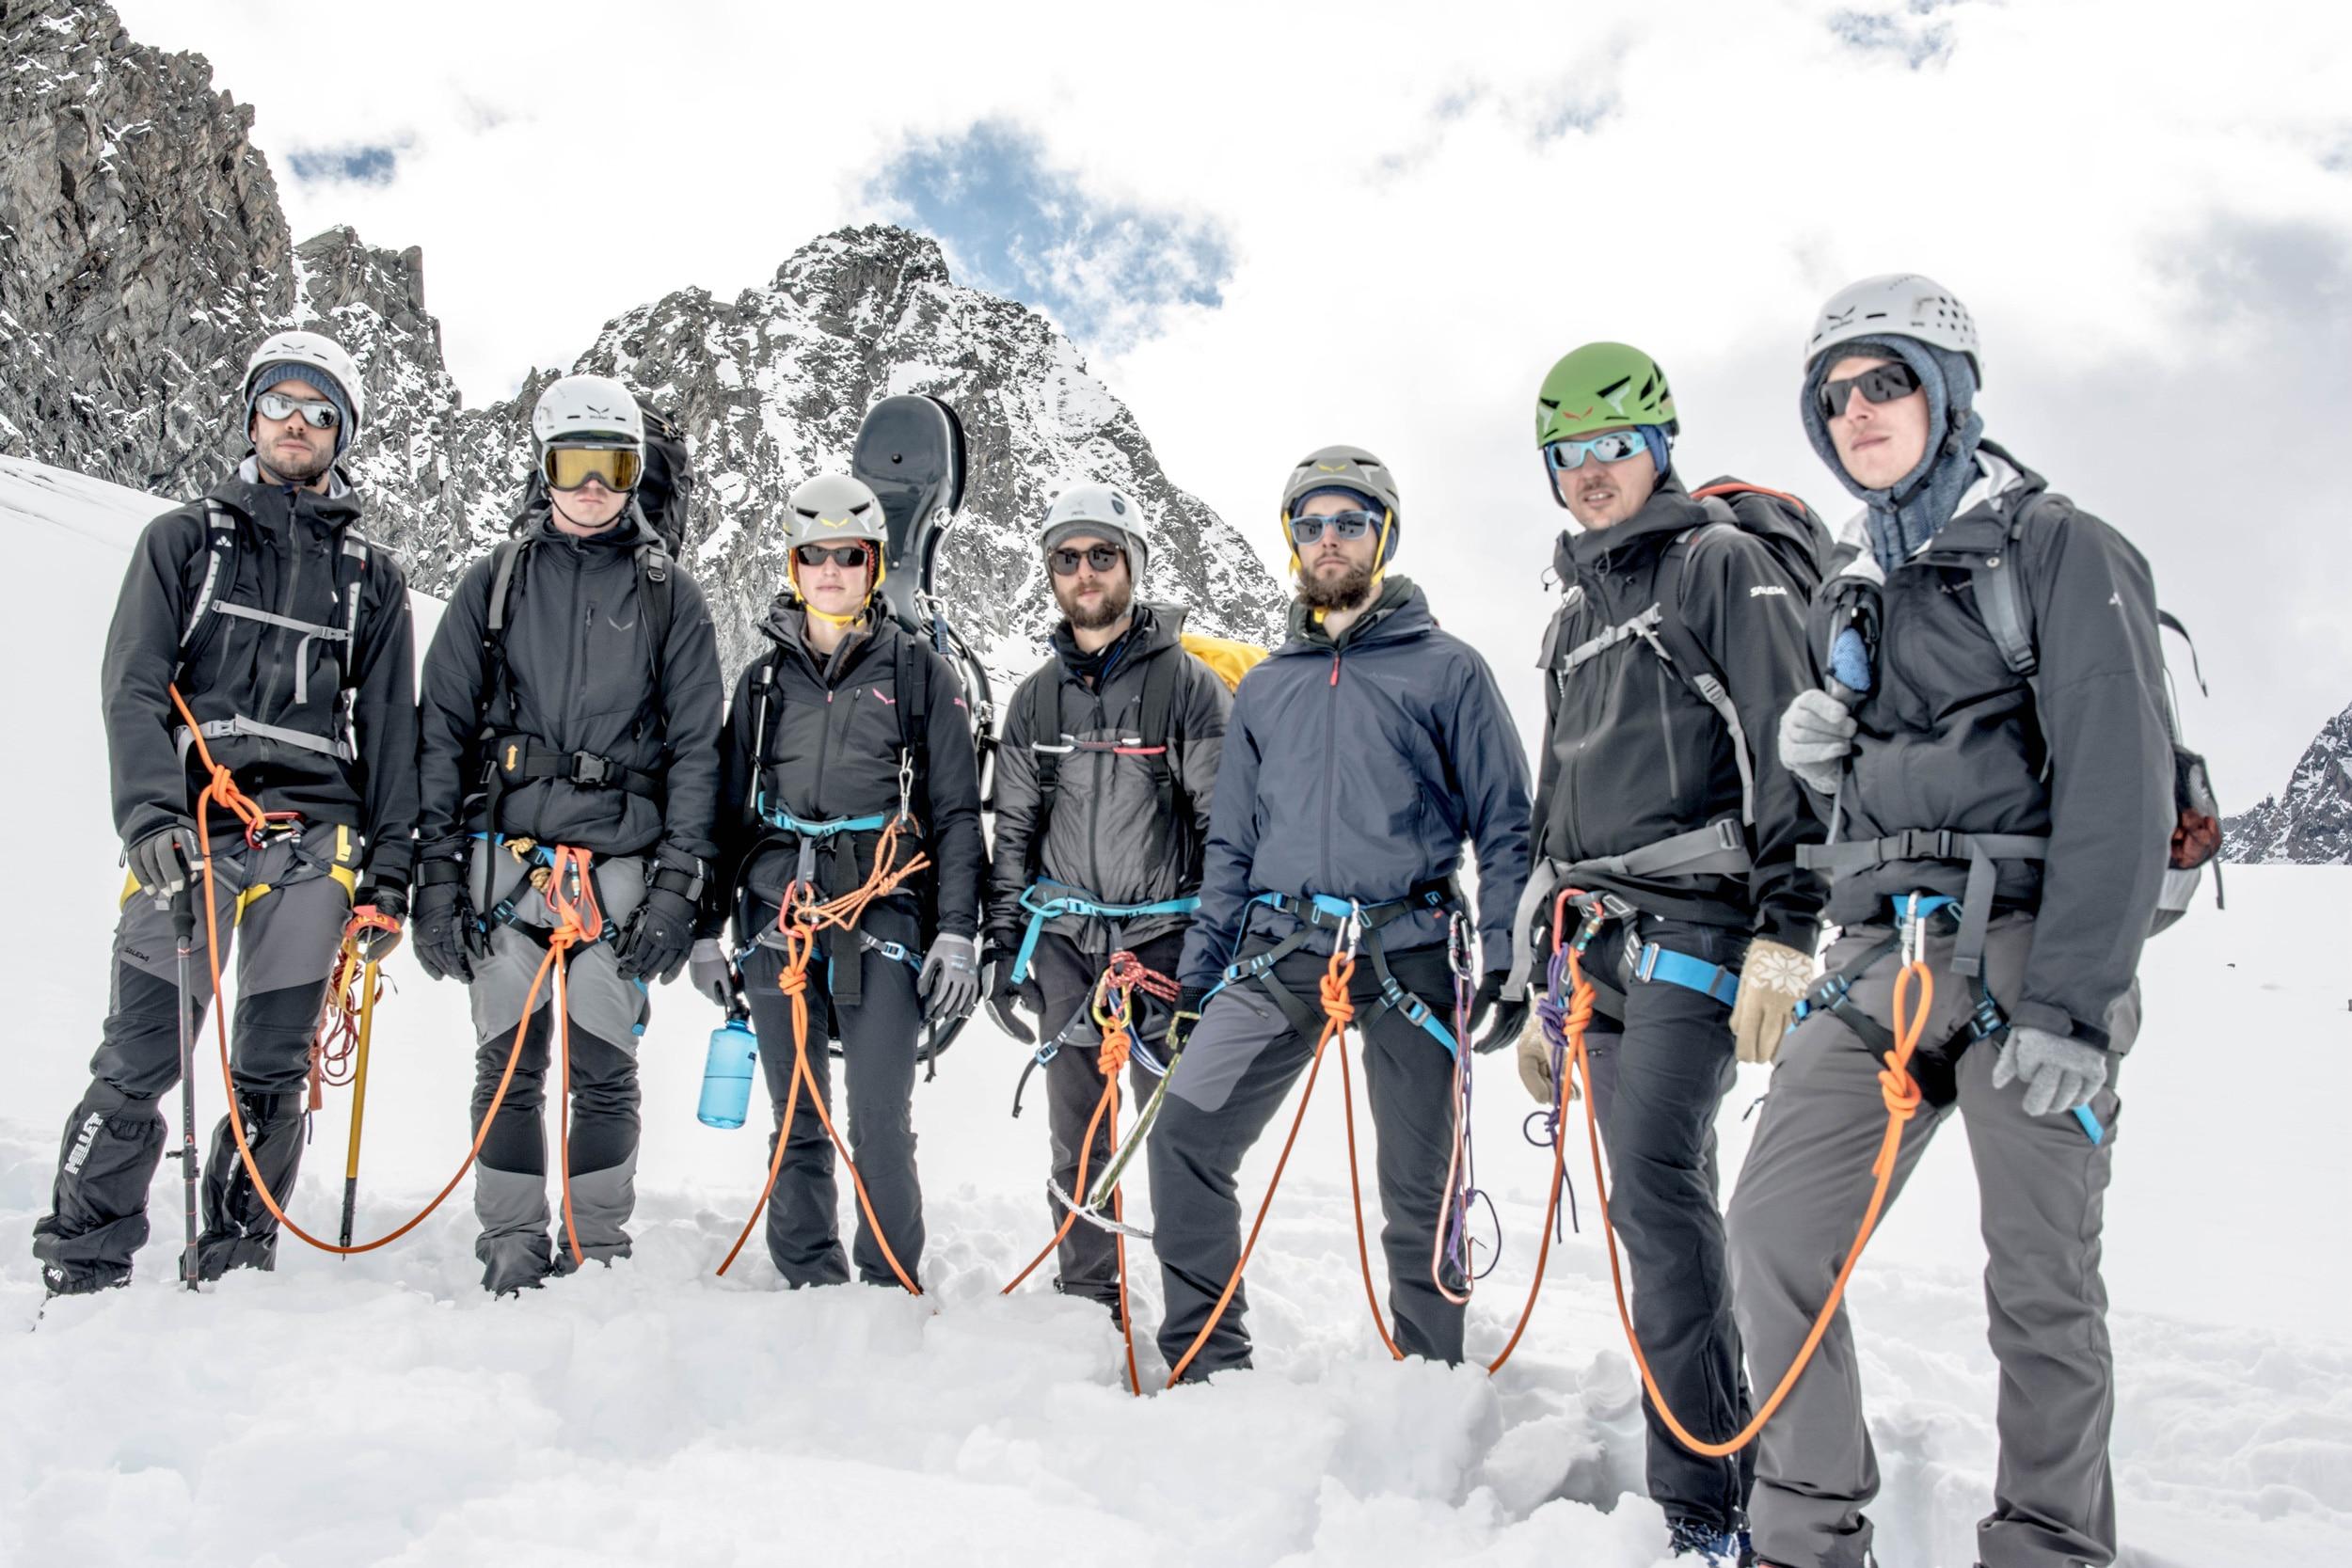 Klettersteig Uk : Parasol peaku c u manu delagos musik vom klettersteig bergwelten